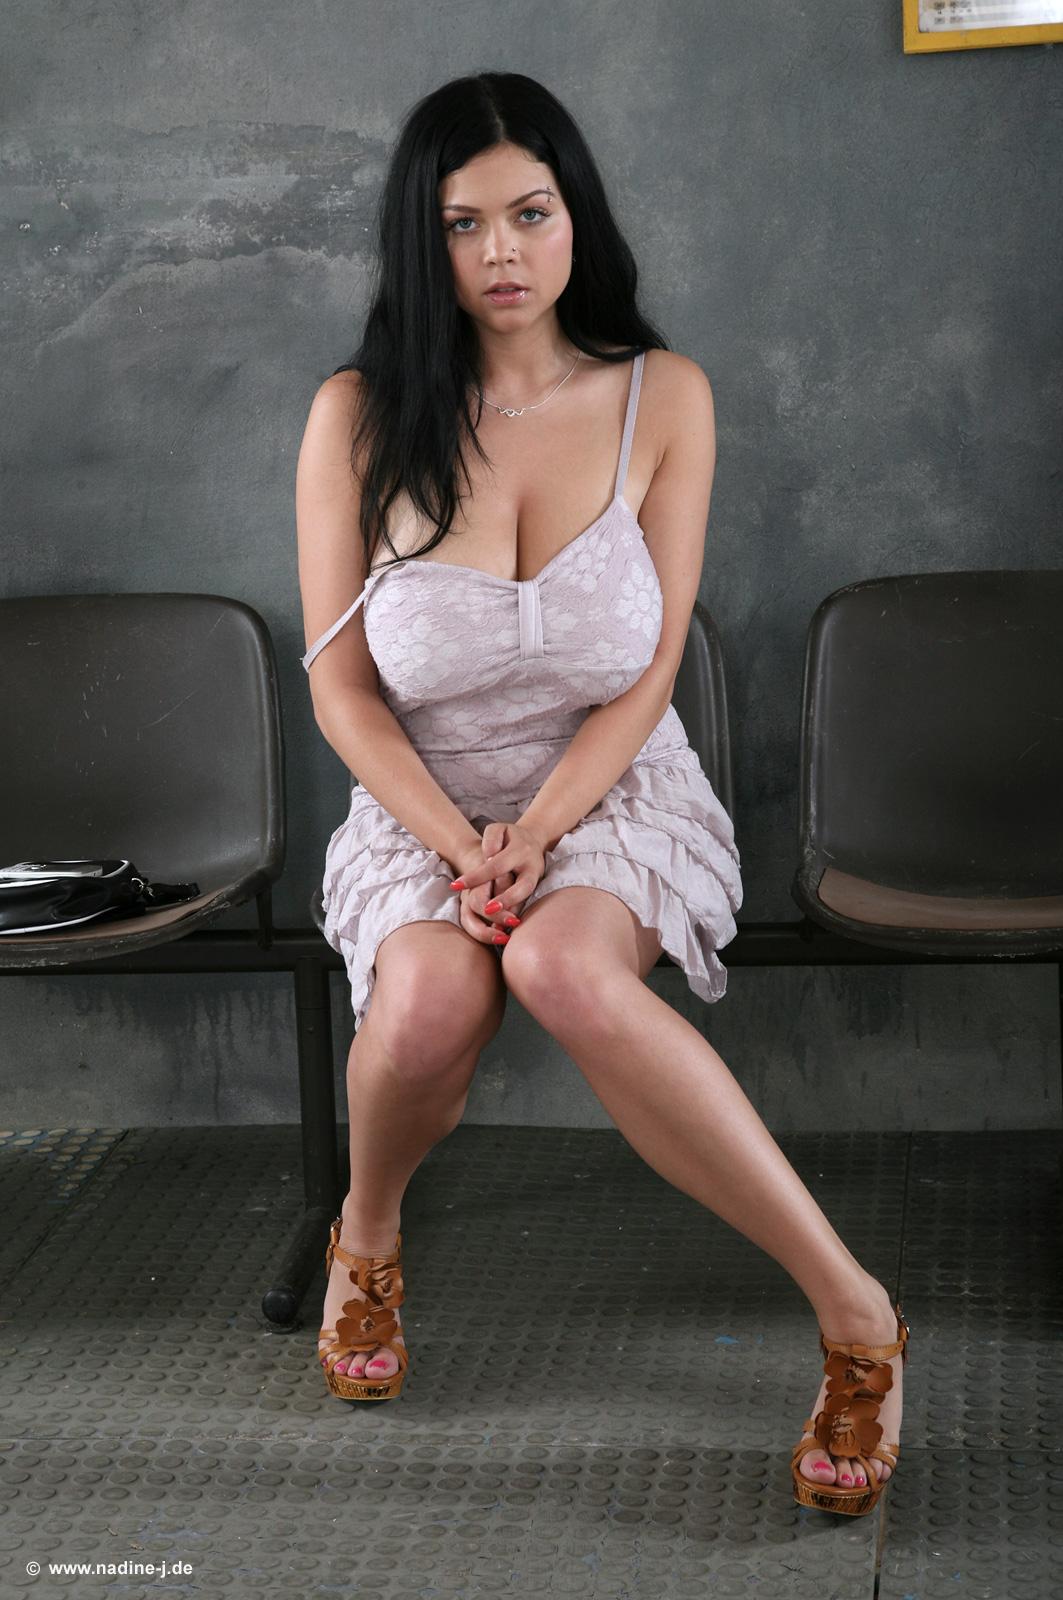 Female vein fetish